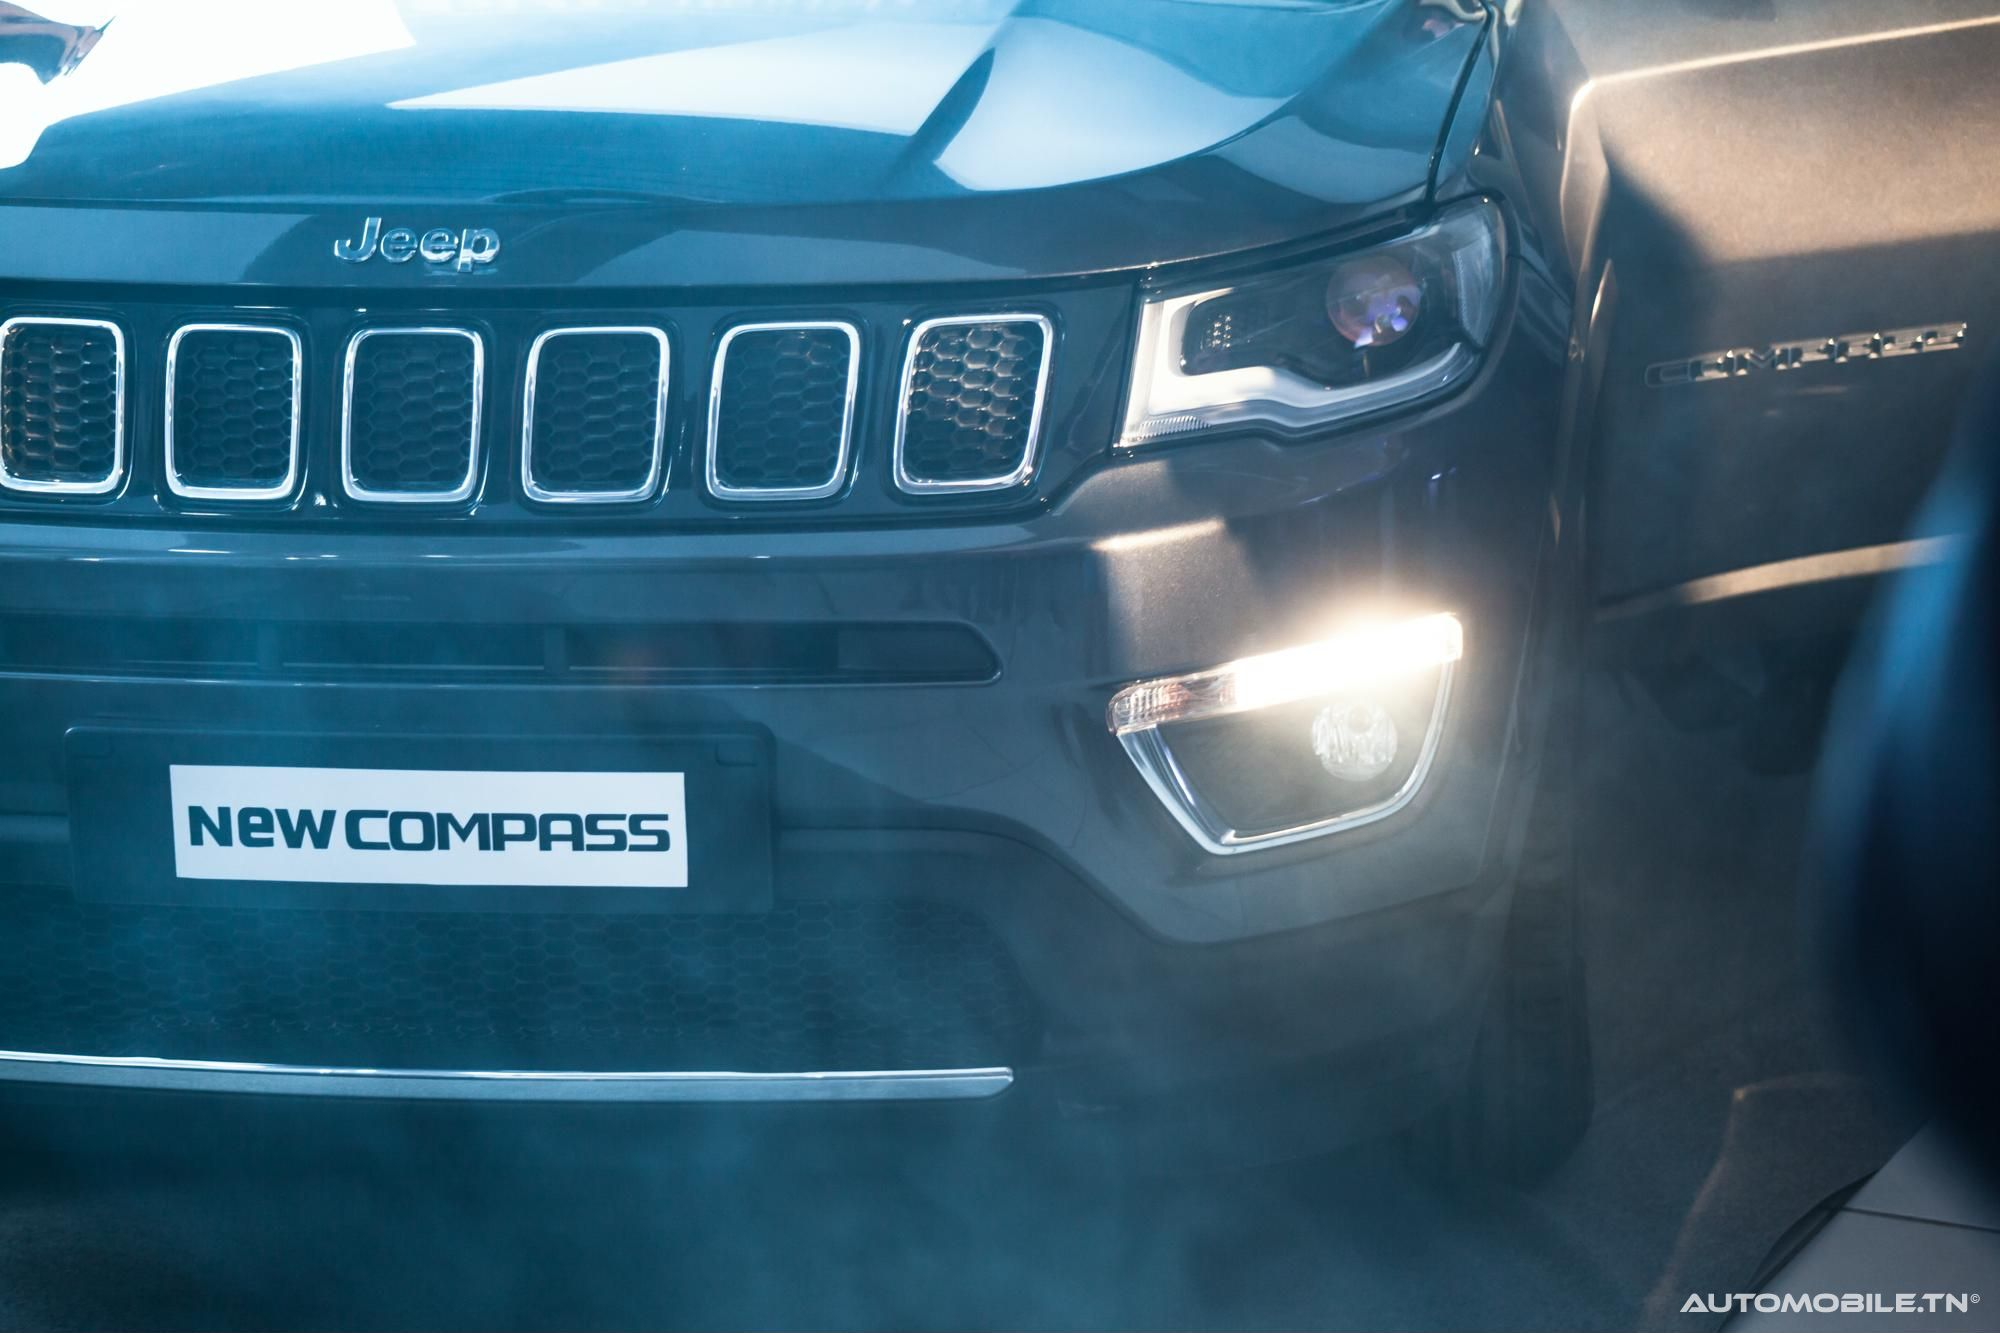 prix jeep compass 1 4 t 170 limited 4x4 bva neuve 168 000 dt. Black Bedroom Furniture Sets. Home Design Ideas